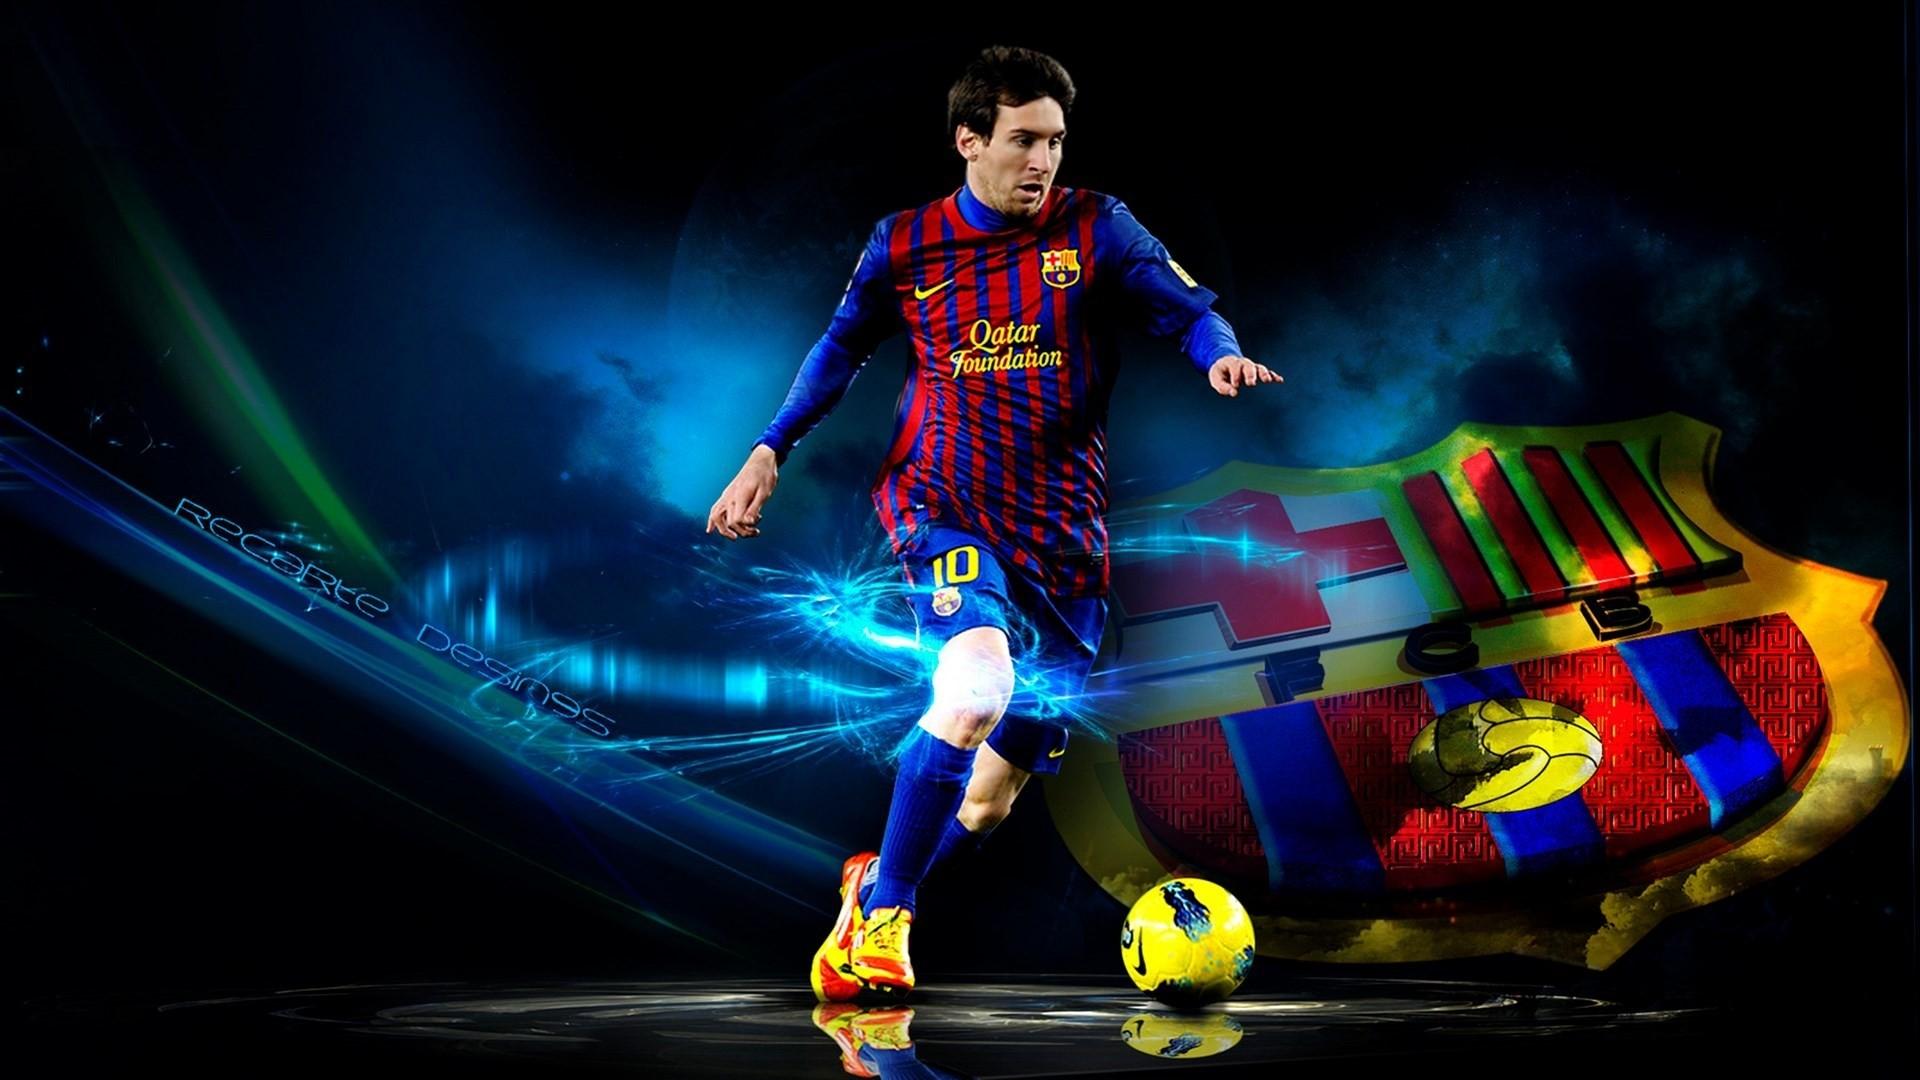 Lionel Messi a wallpaper